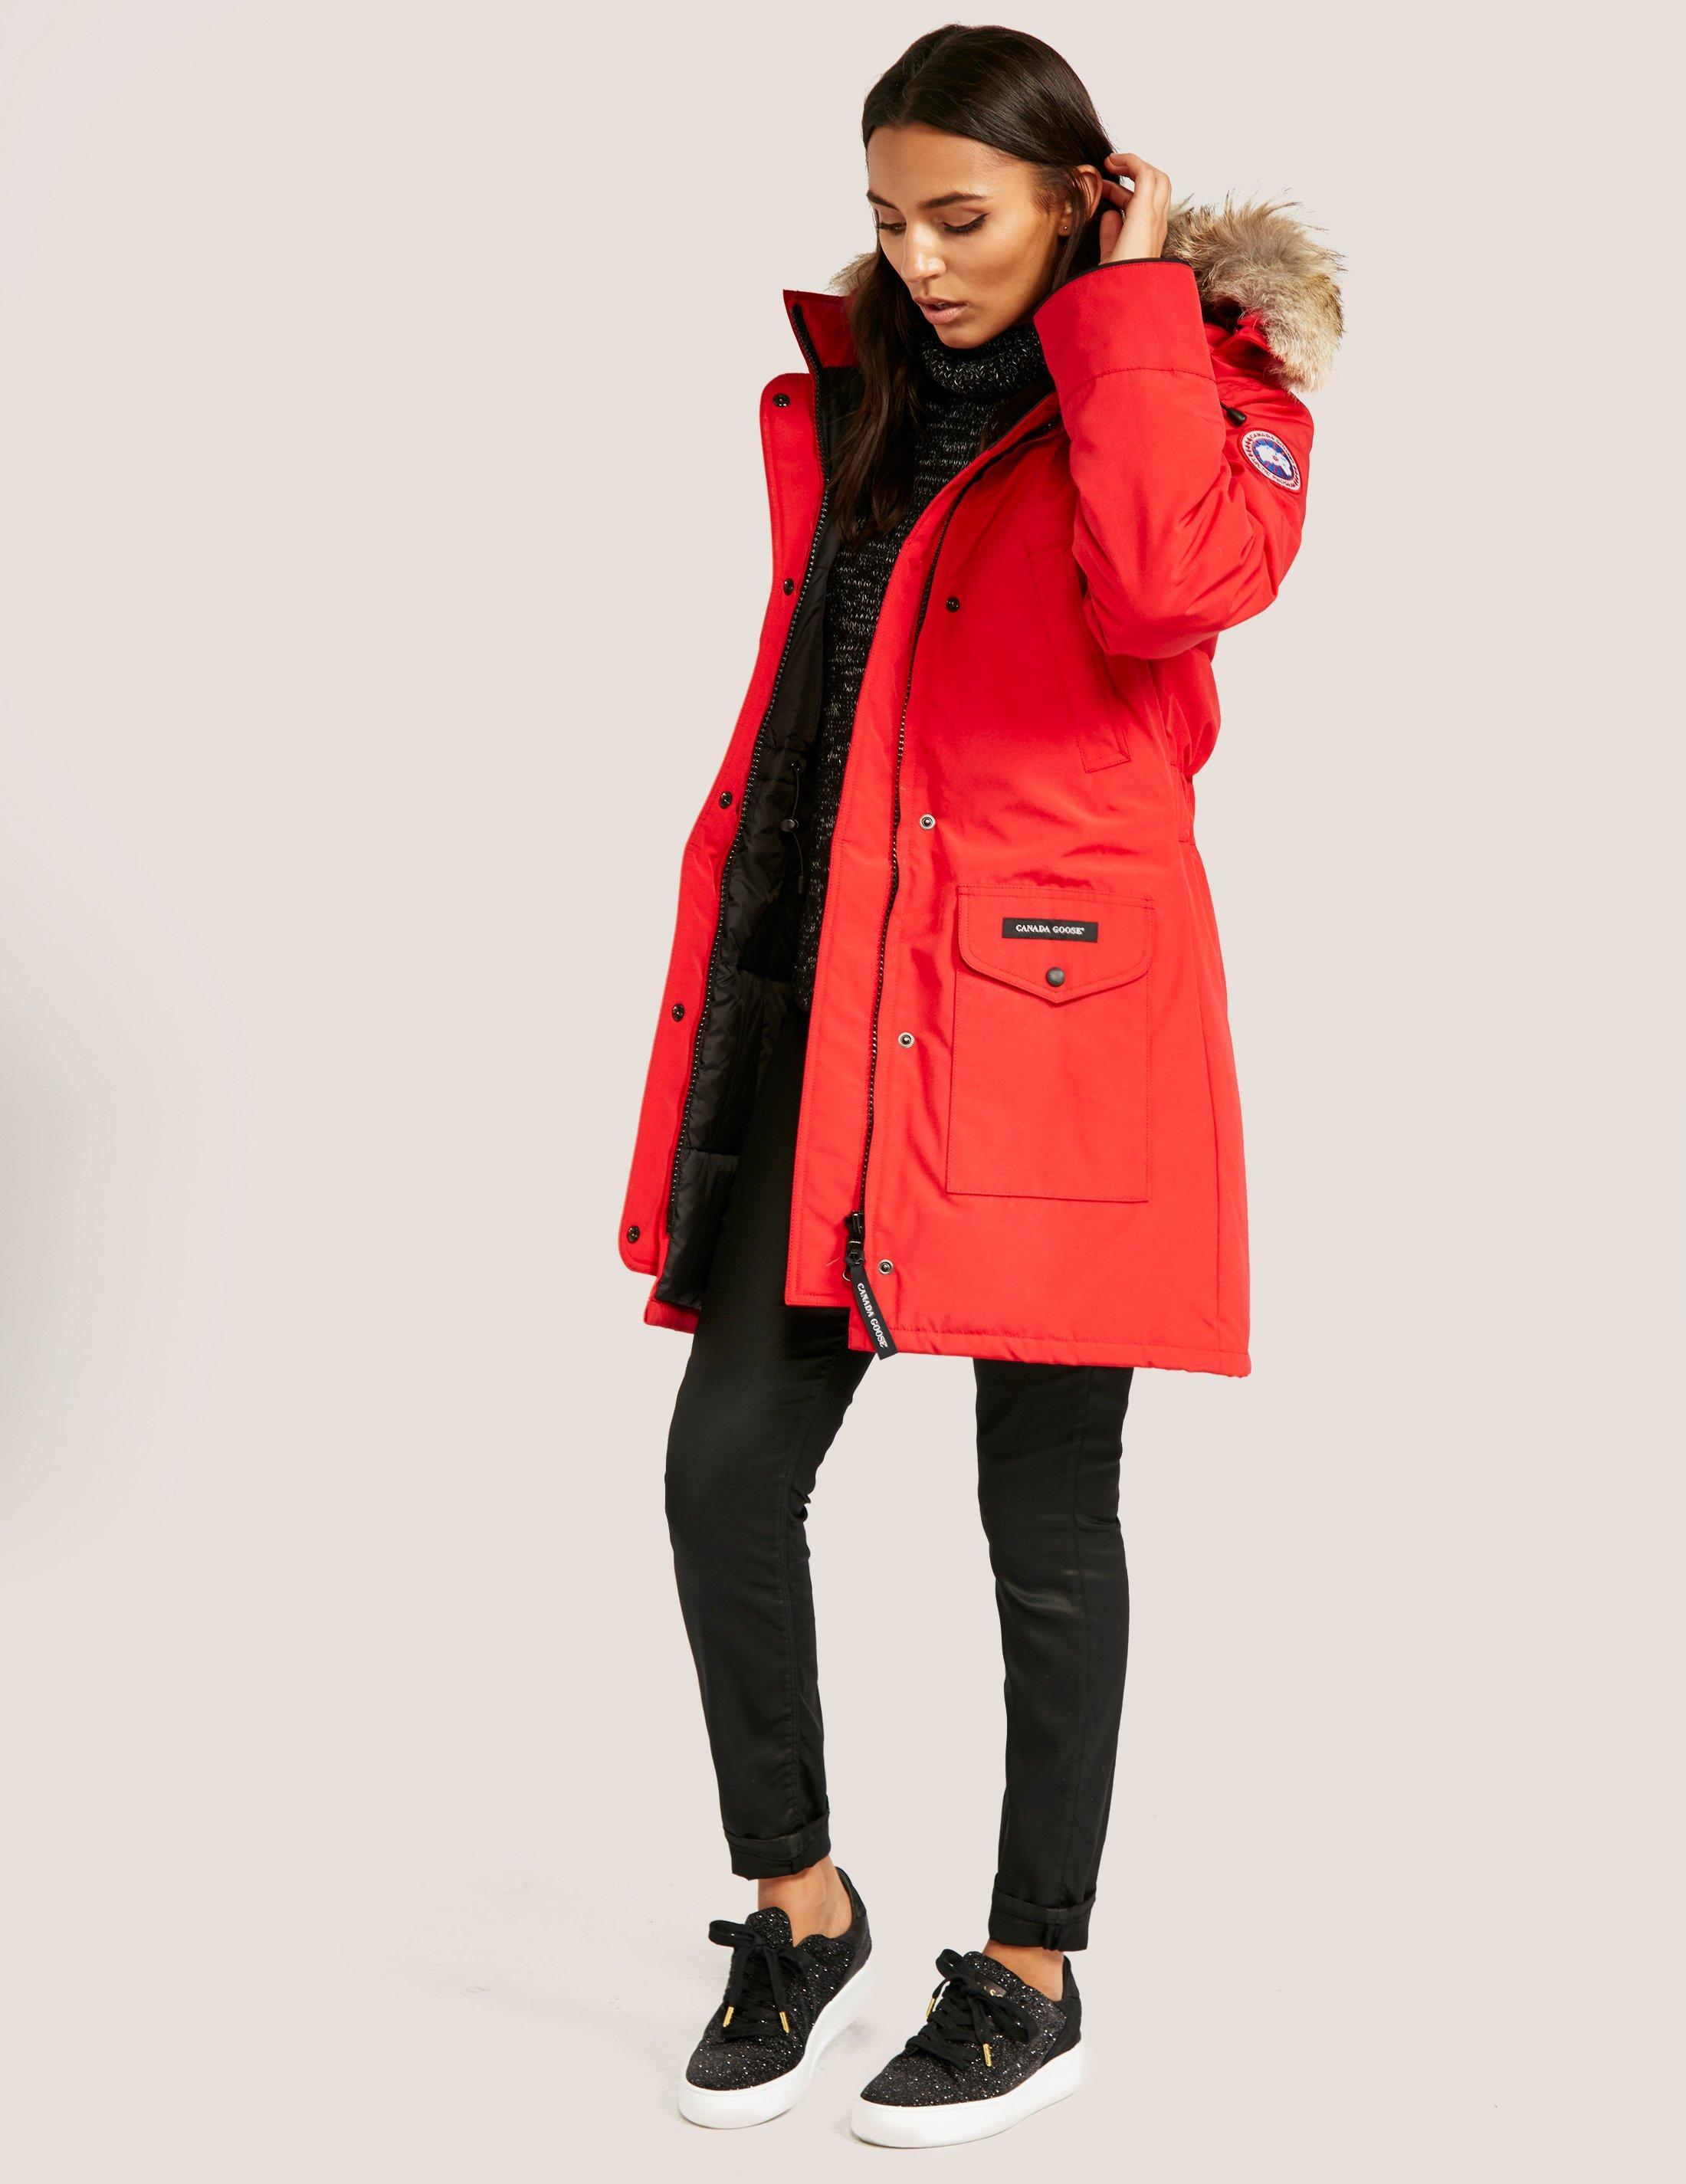 Trillium parka jacket in red